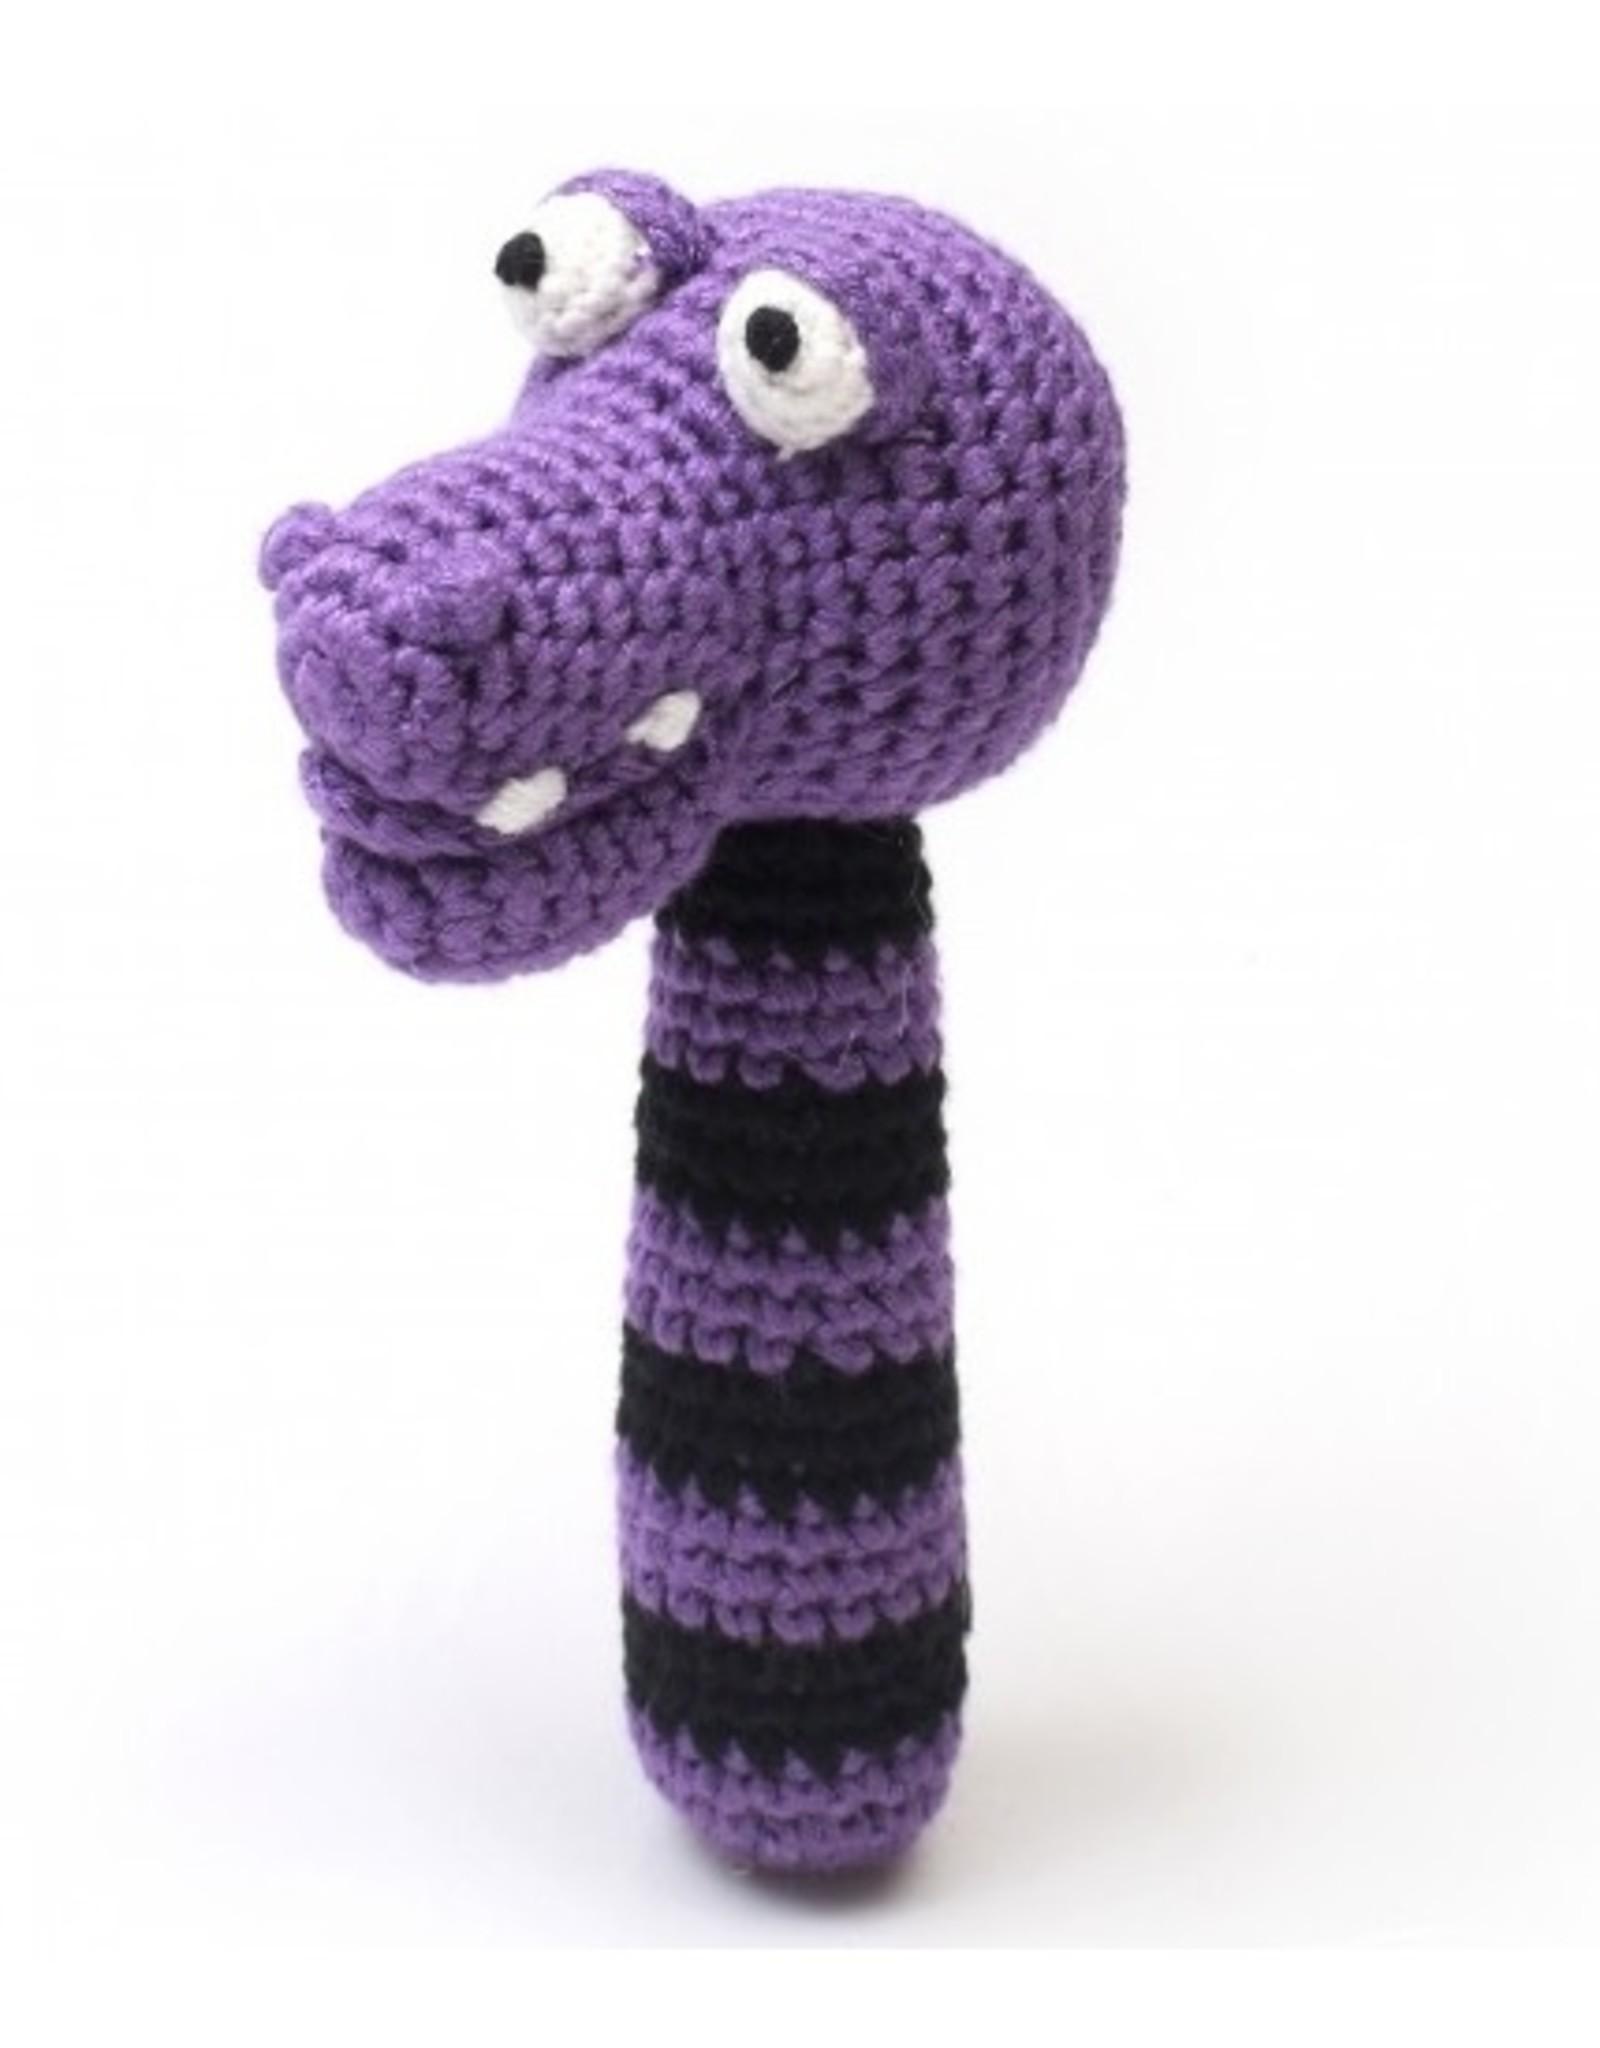 natureZOO stickrattle - miss Croc